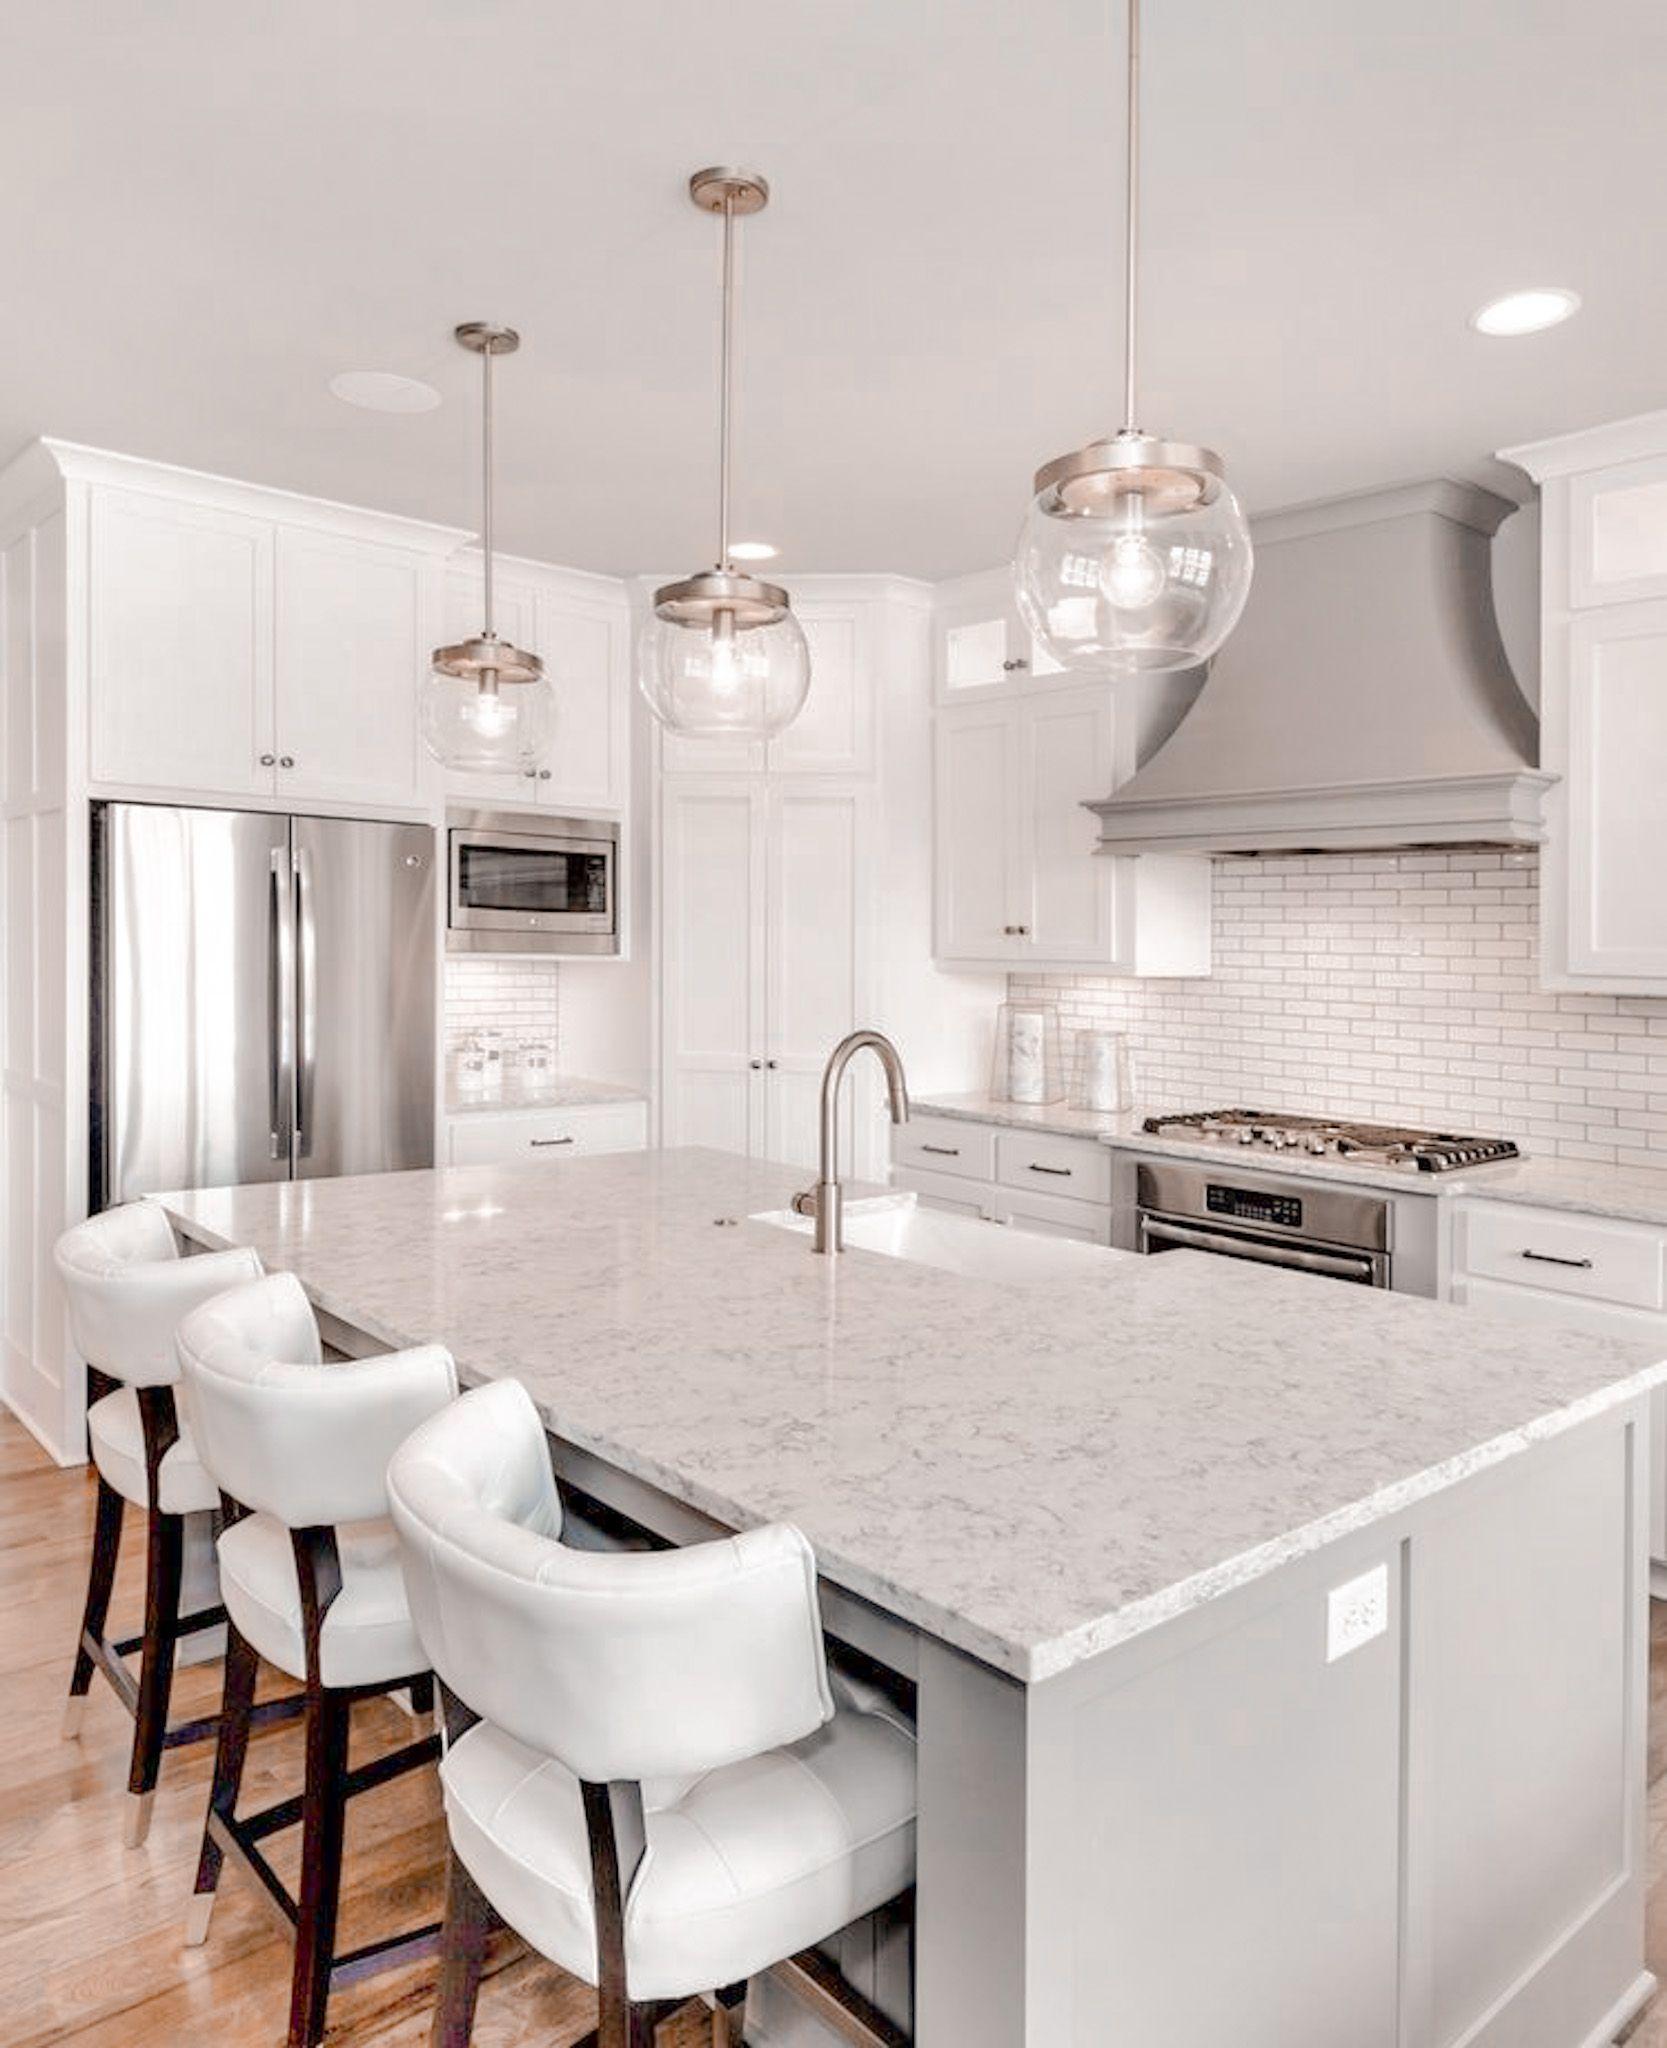 Pinterest Kitchen Inspiration Design Modern Kitchen Design Kitchen Design